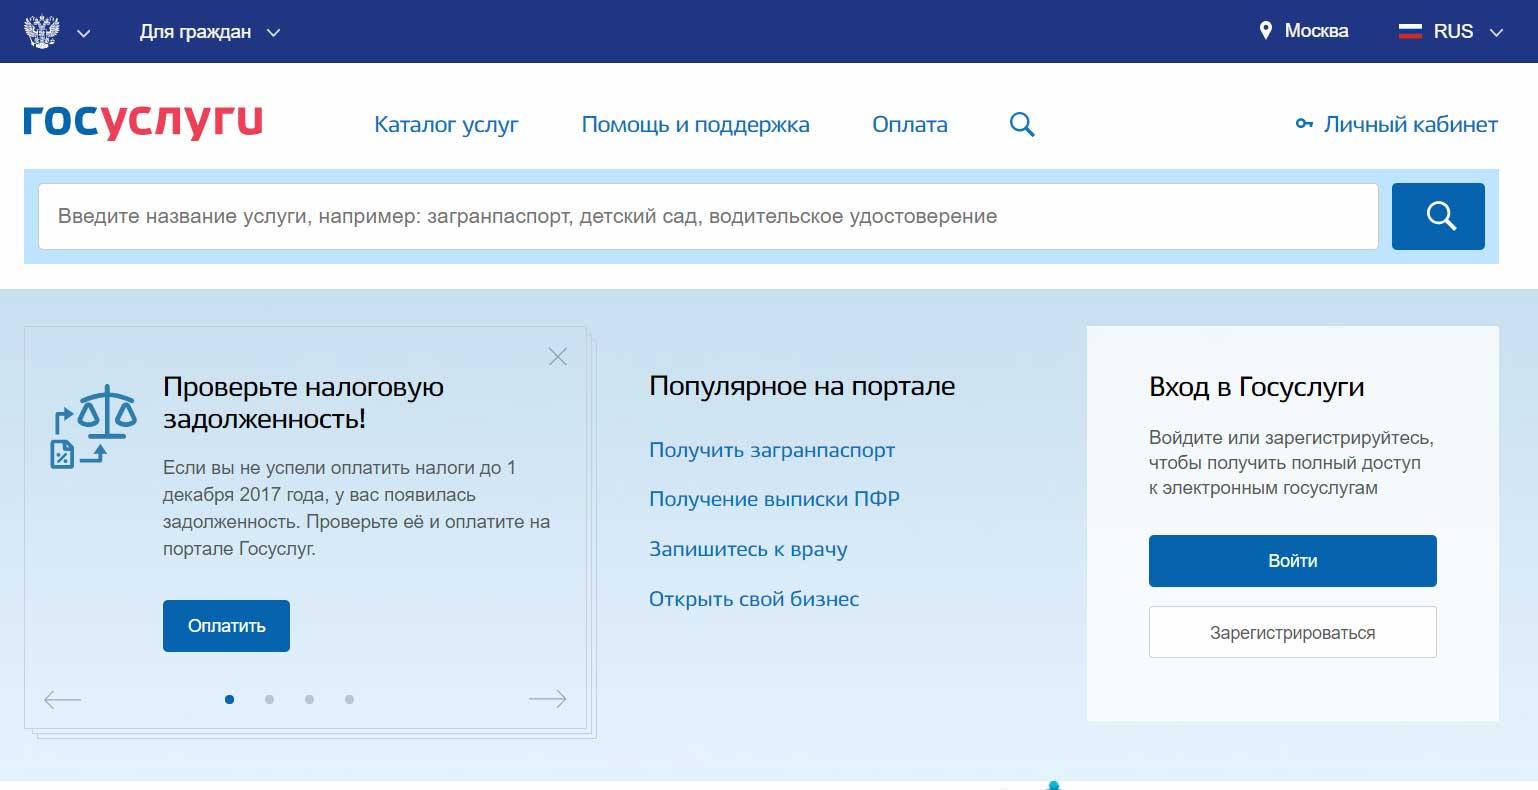 Заявку на технический паспорт можно подать через сайт Госуслуги - https://www.gosuslugi.ru/